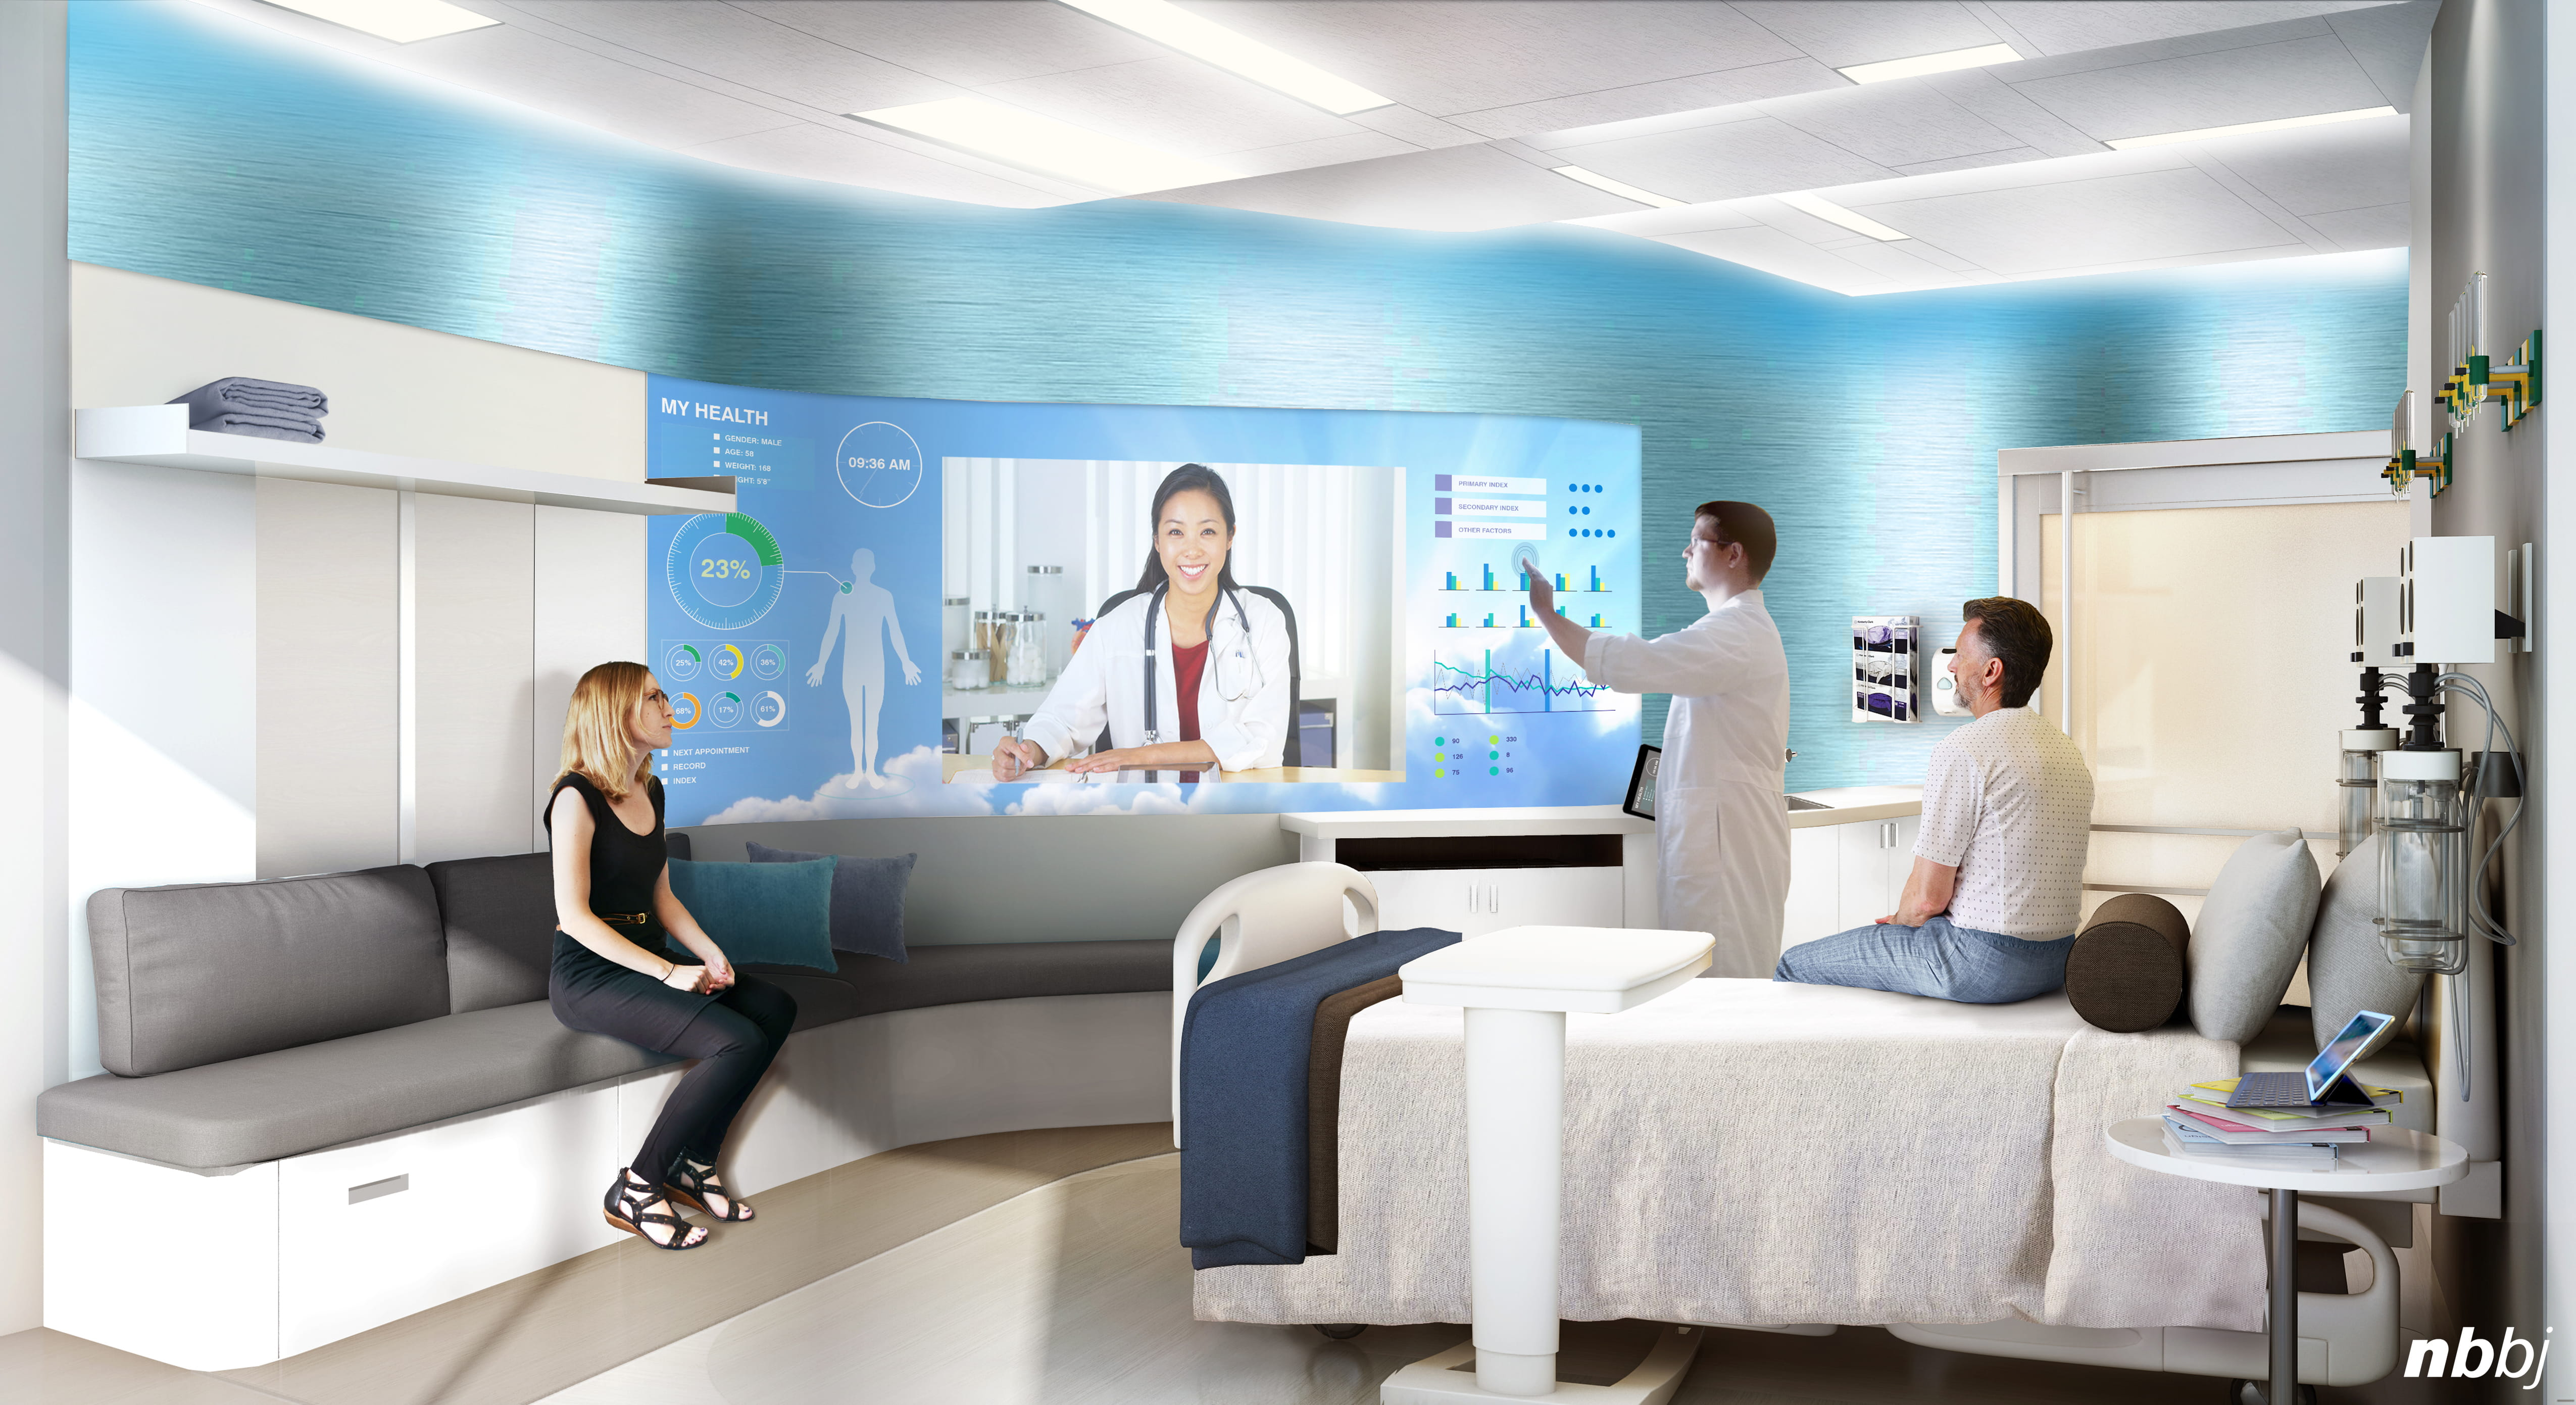 UPMC Hillman Cancer Hospital